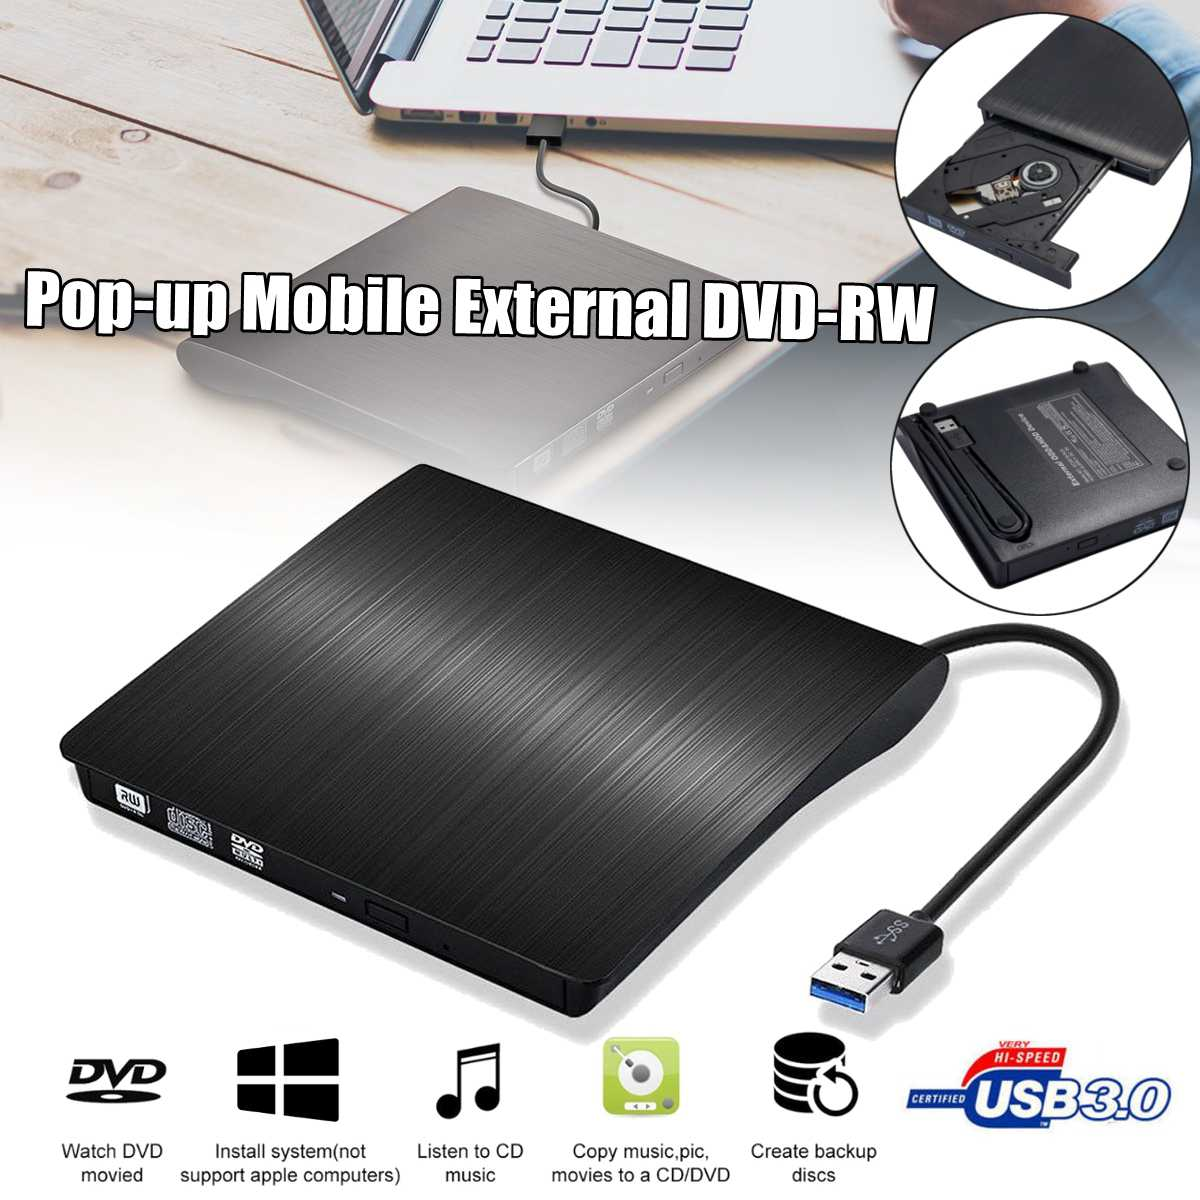 USB 3.0 Slim External DVD RW CD Writer Drive Burner Reader Player Optical Drives For PC Laptop